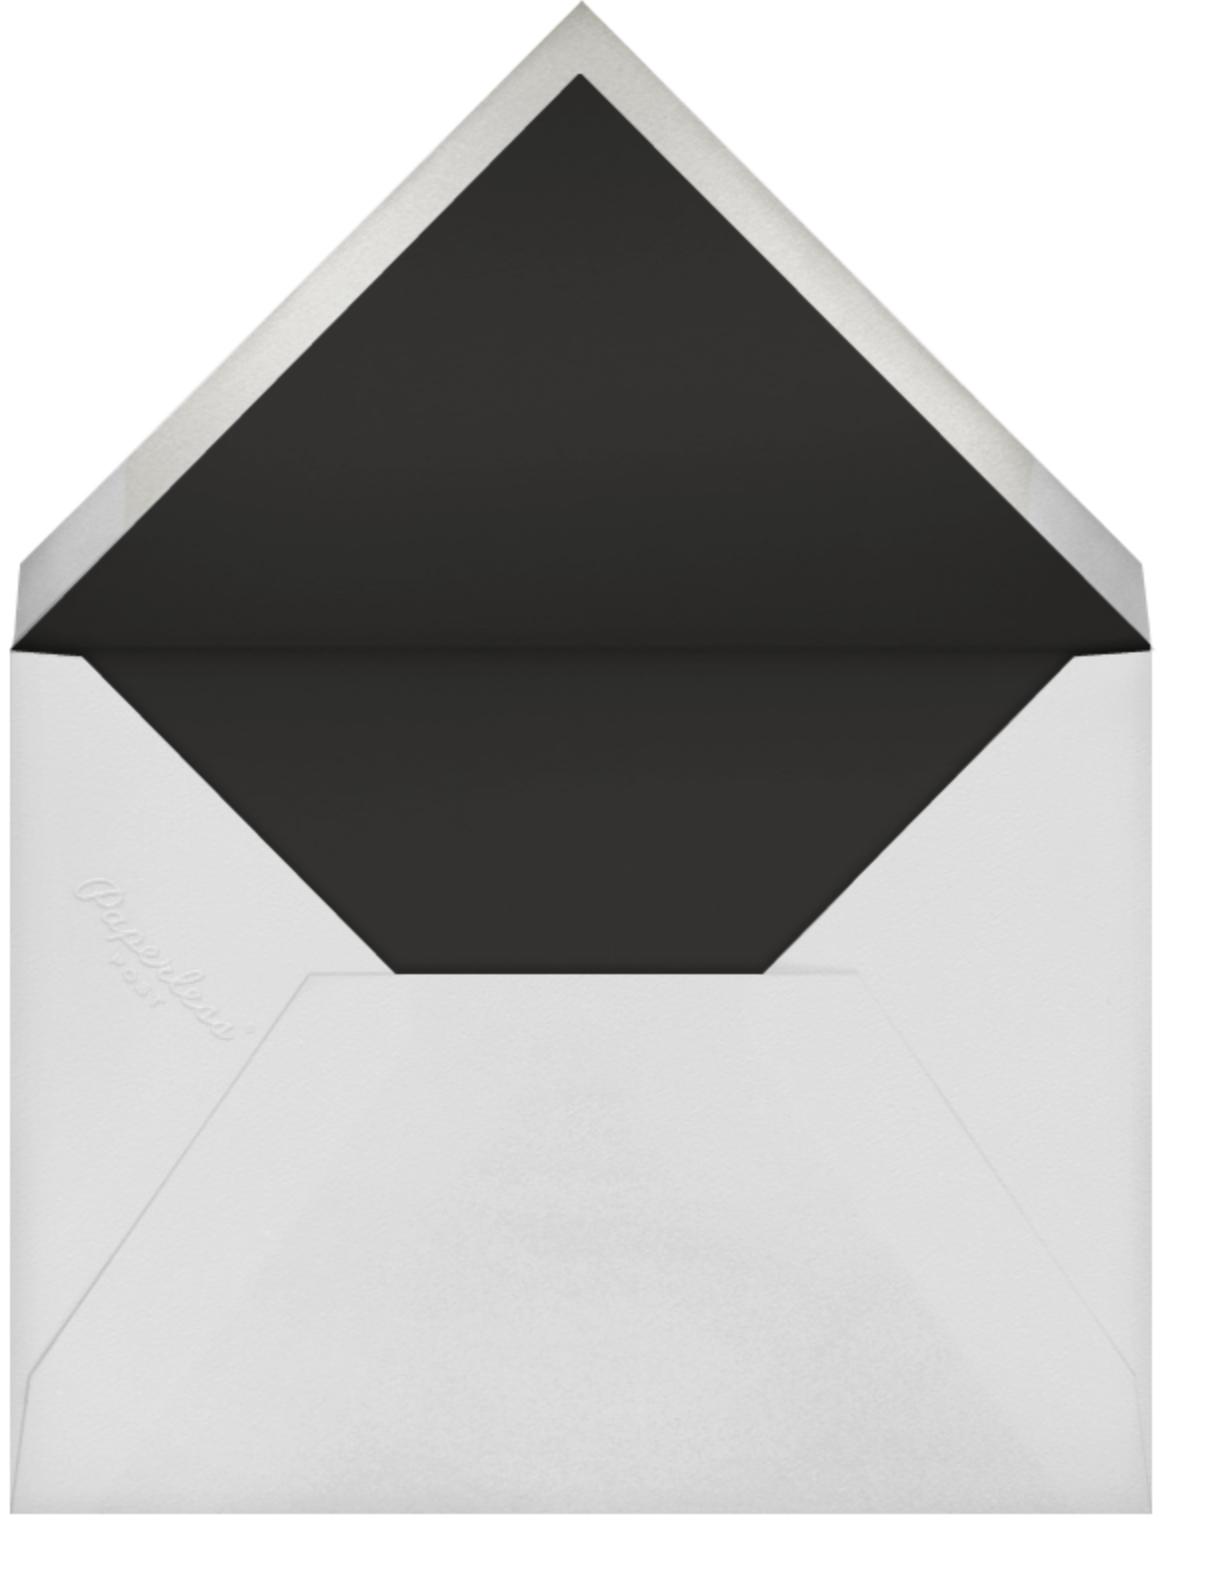 Richmond Park (Save the Date) - Navy/Silver - Oscar de la Renta - Save the date - envelope back